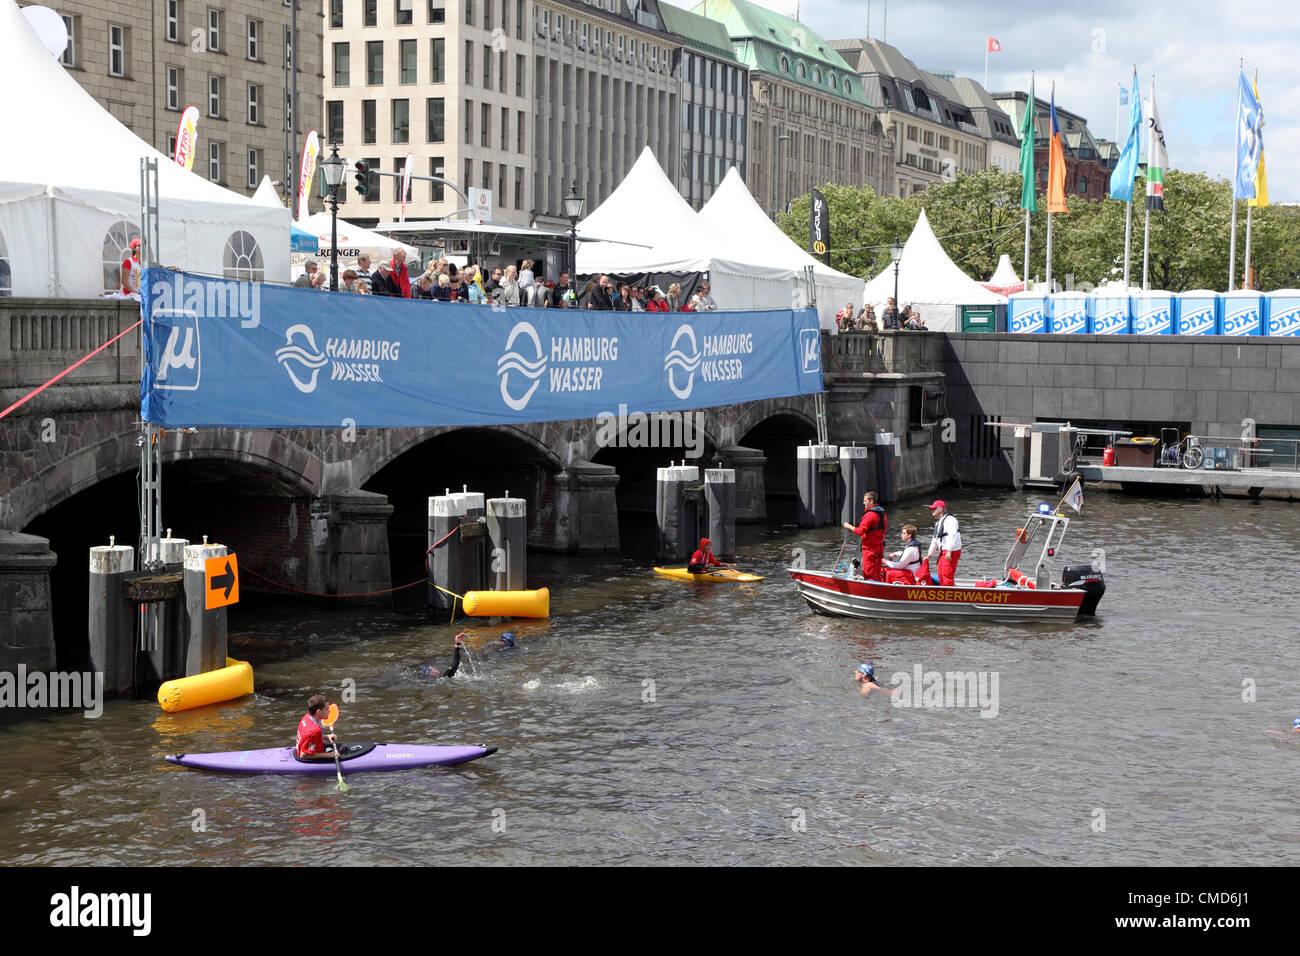 Energia destrogiro Triathlon ITU World Championship Series 2012 Amburgo Immagini Stock